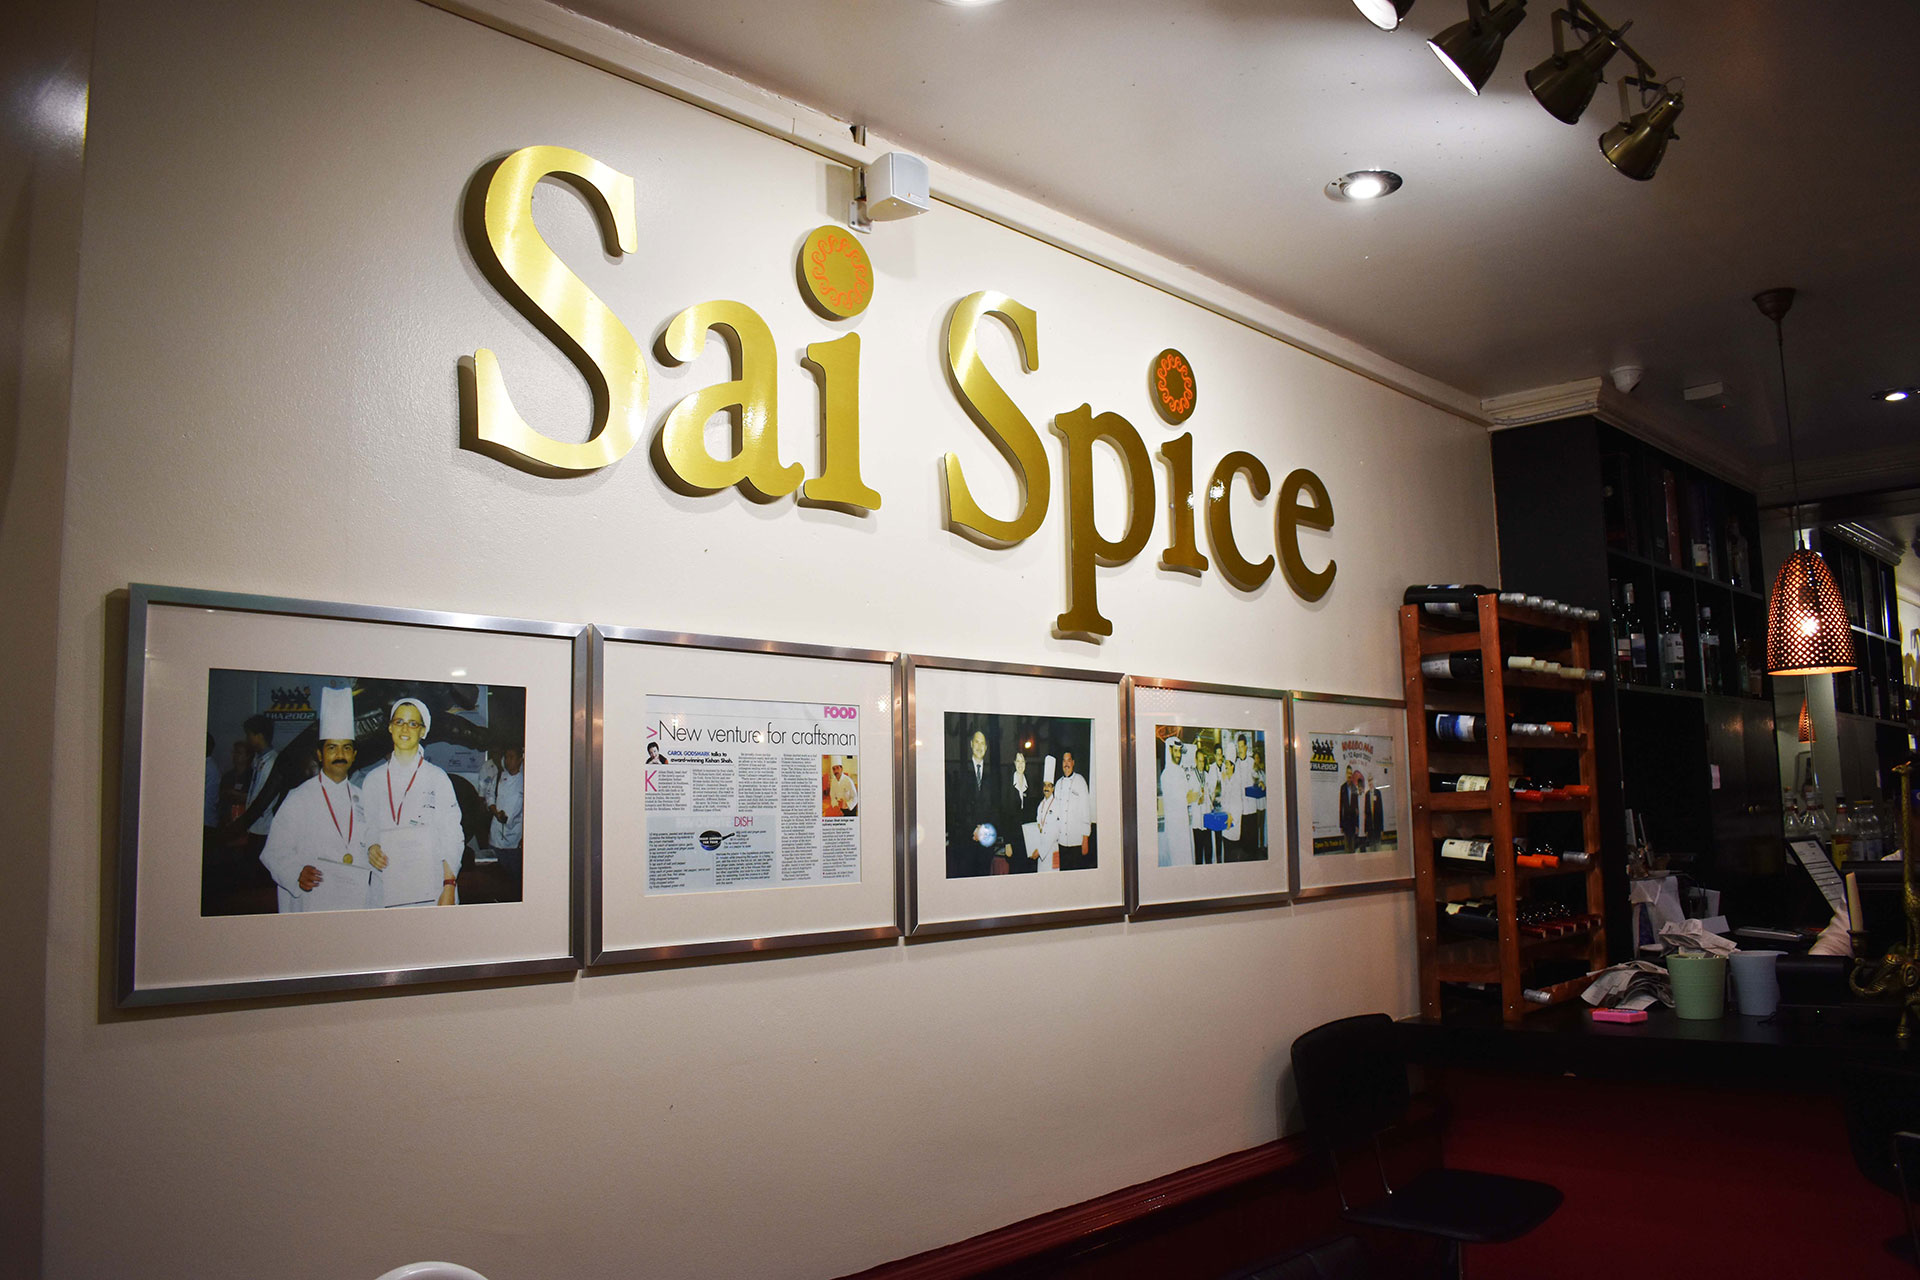 Sai-Spice-Entrance